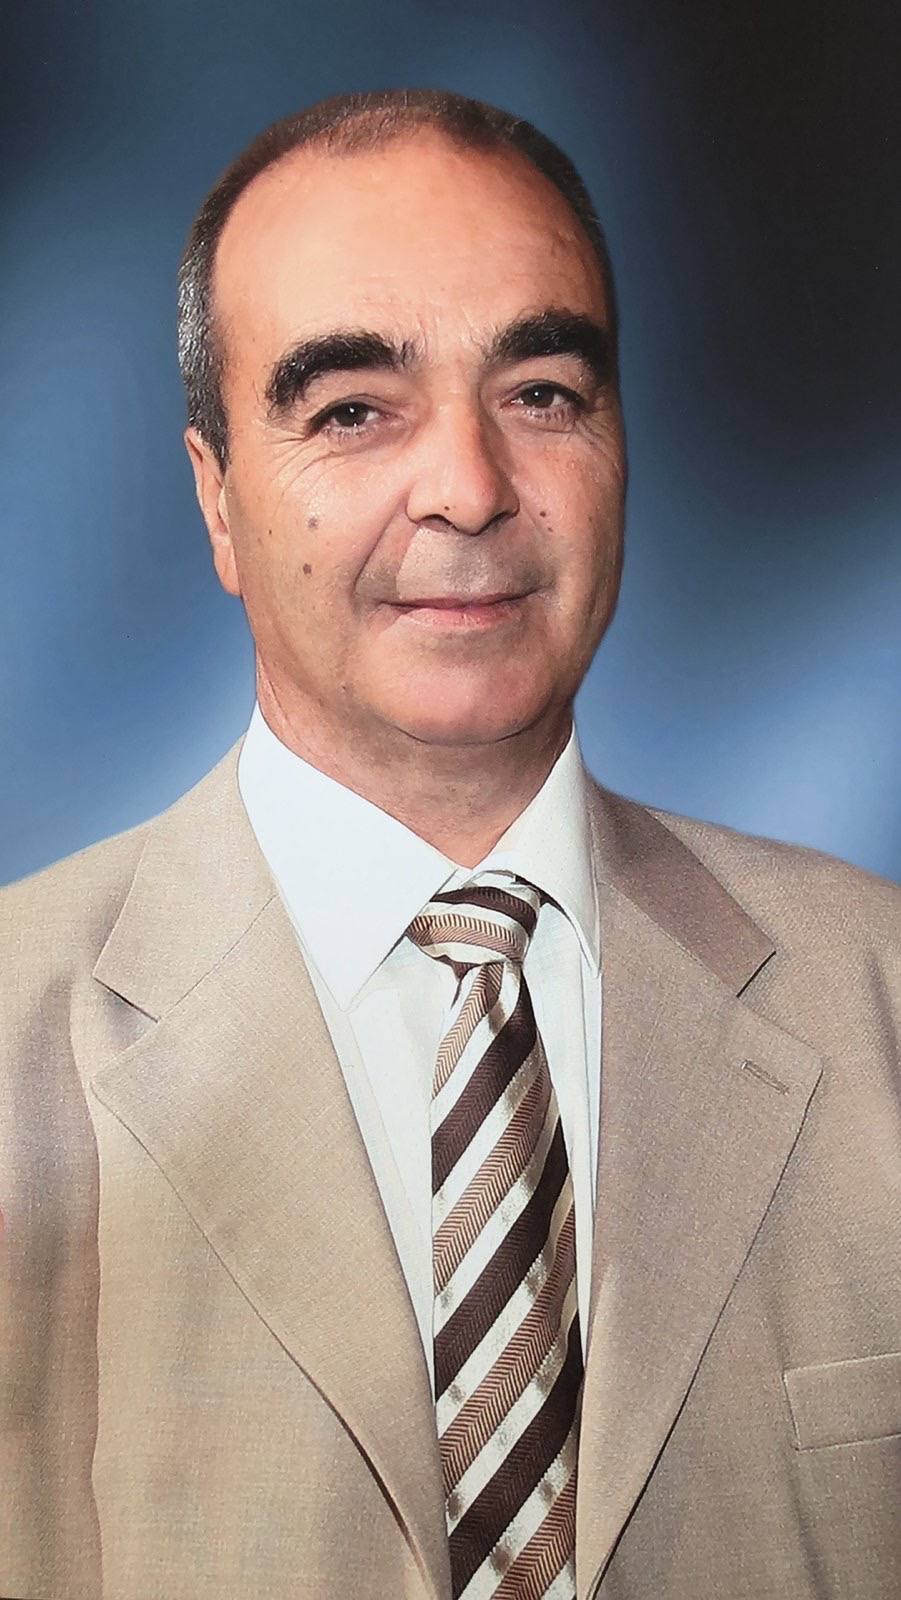 Christodoulos Kartalis